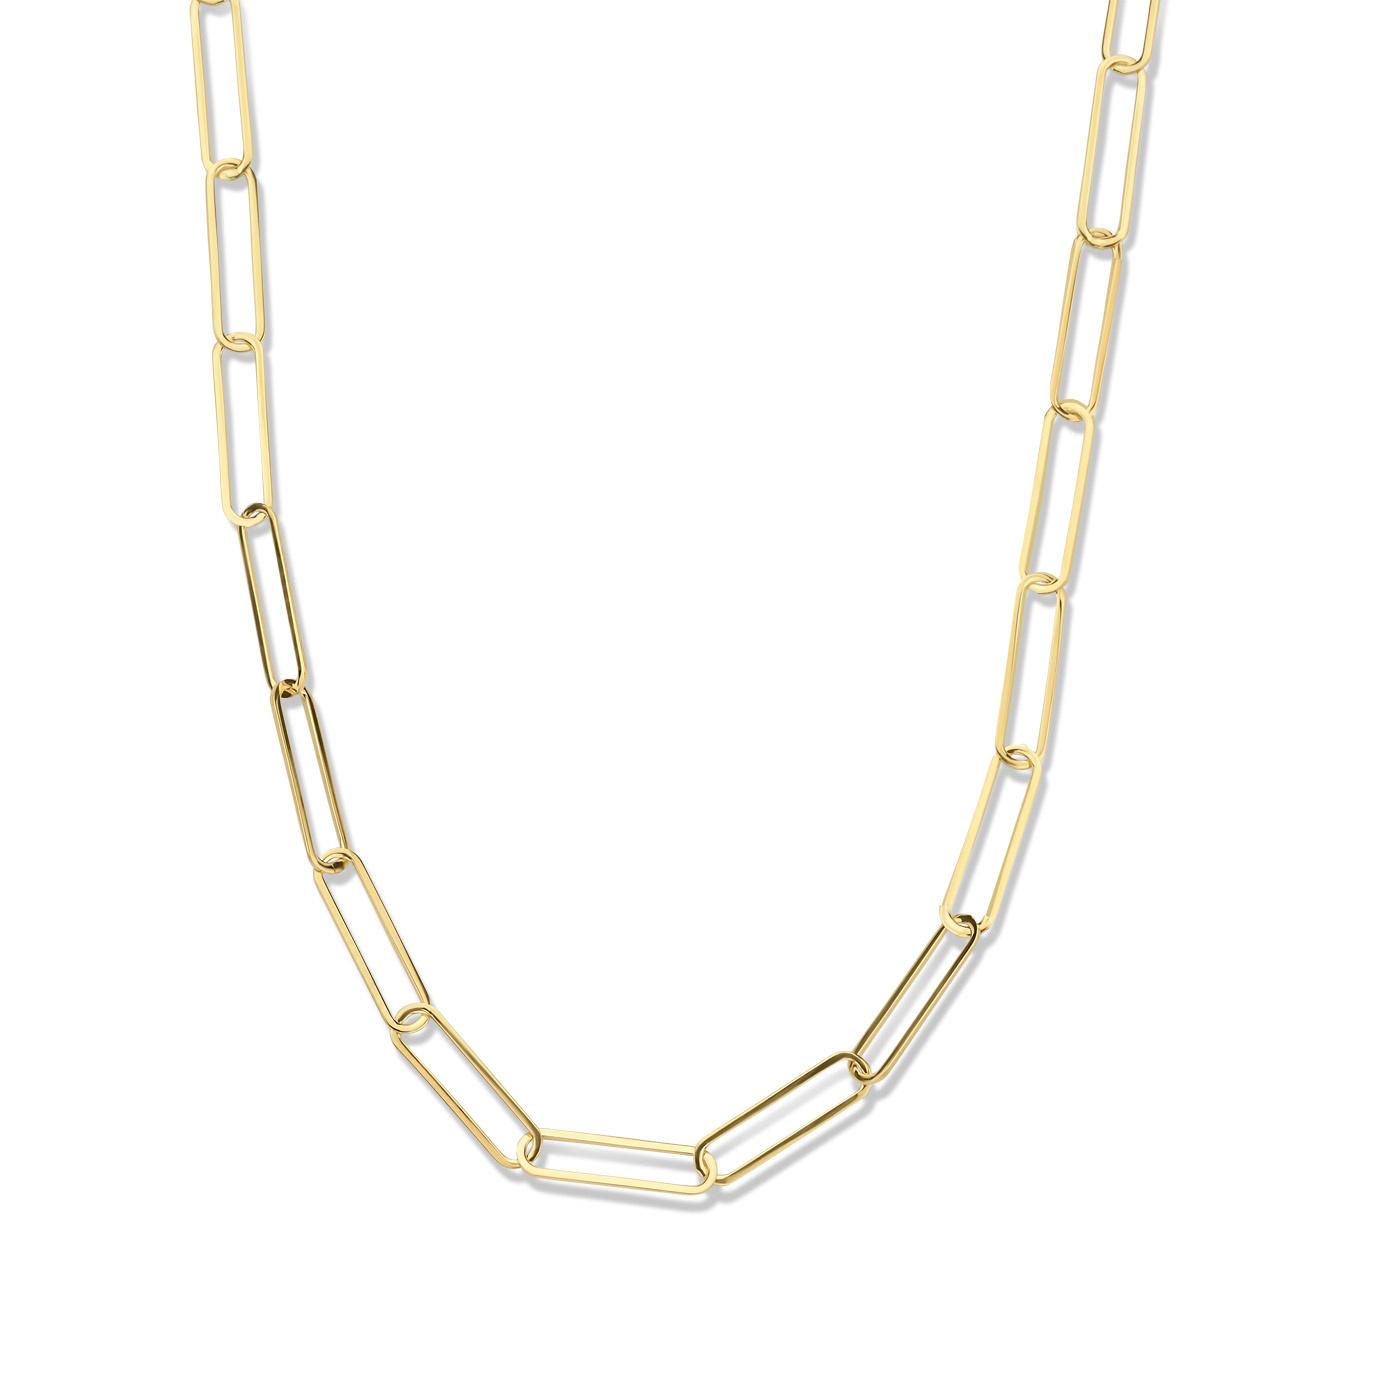 Isabel Bernard Aidee Louise 14 carat gold link chain